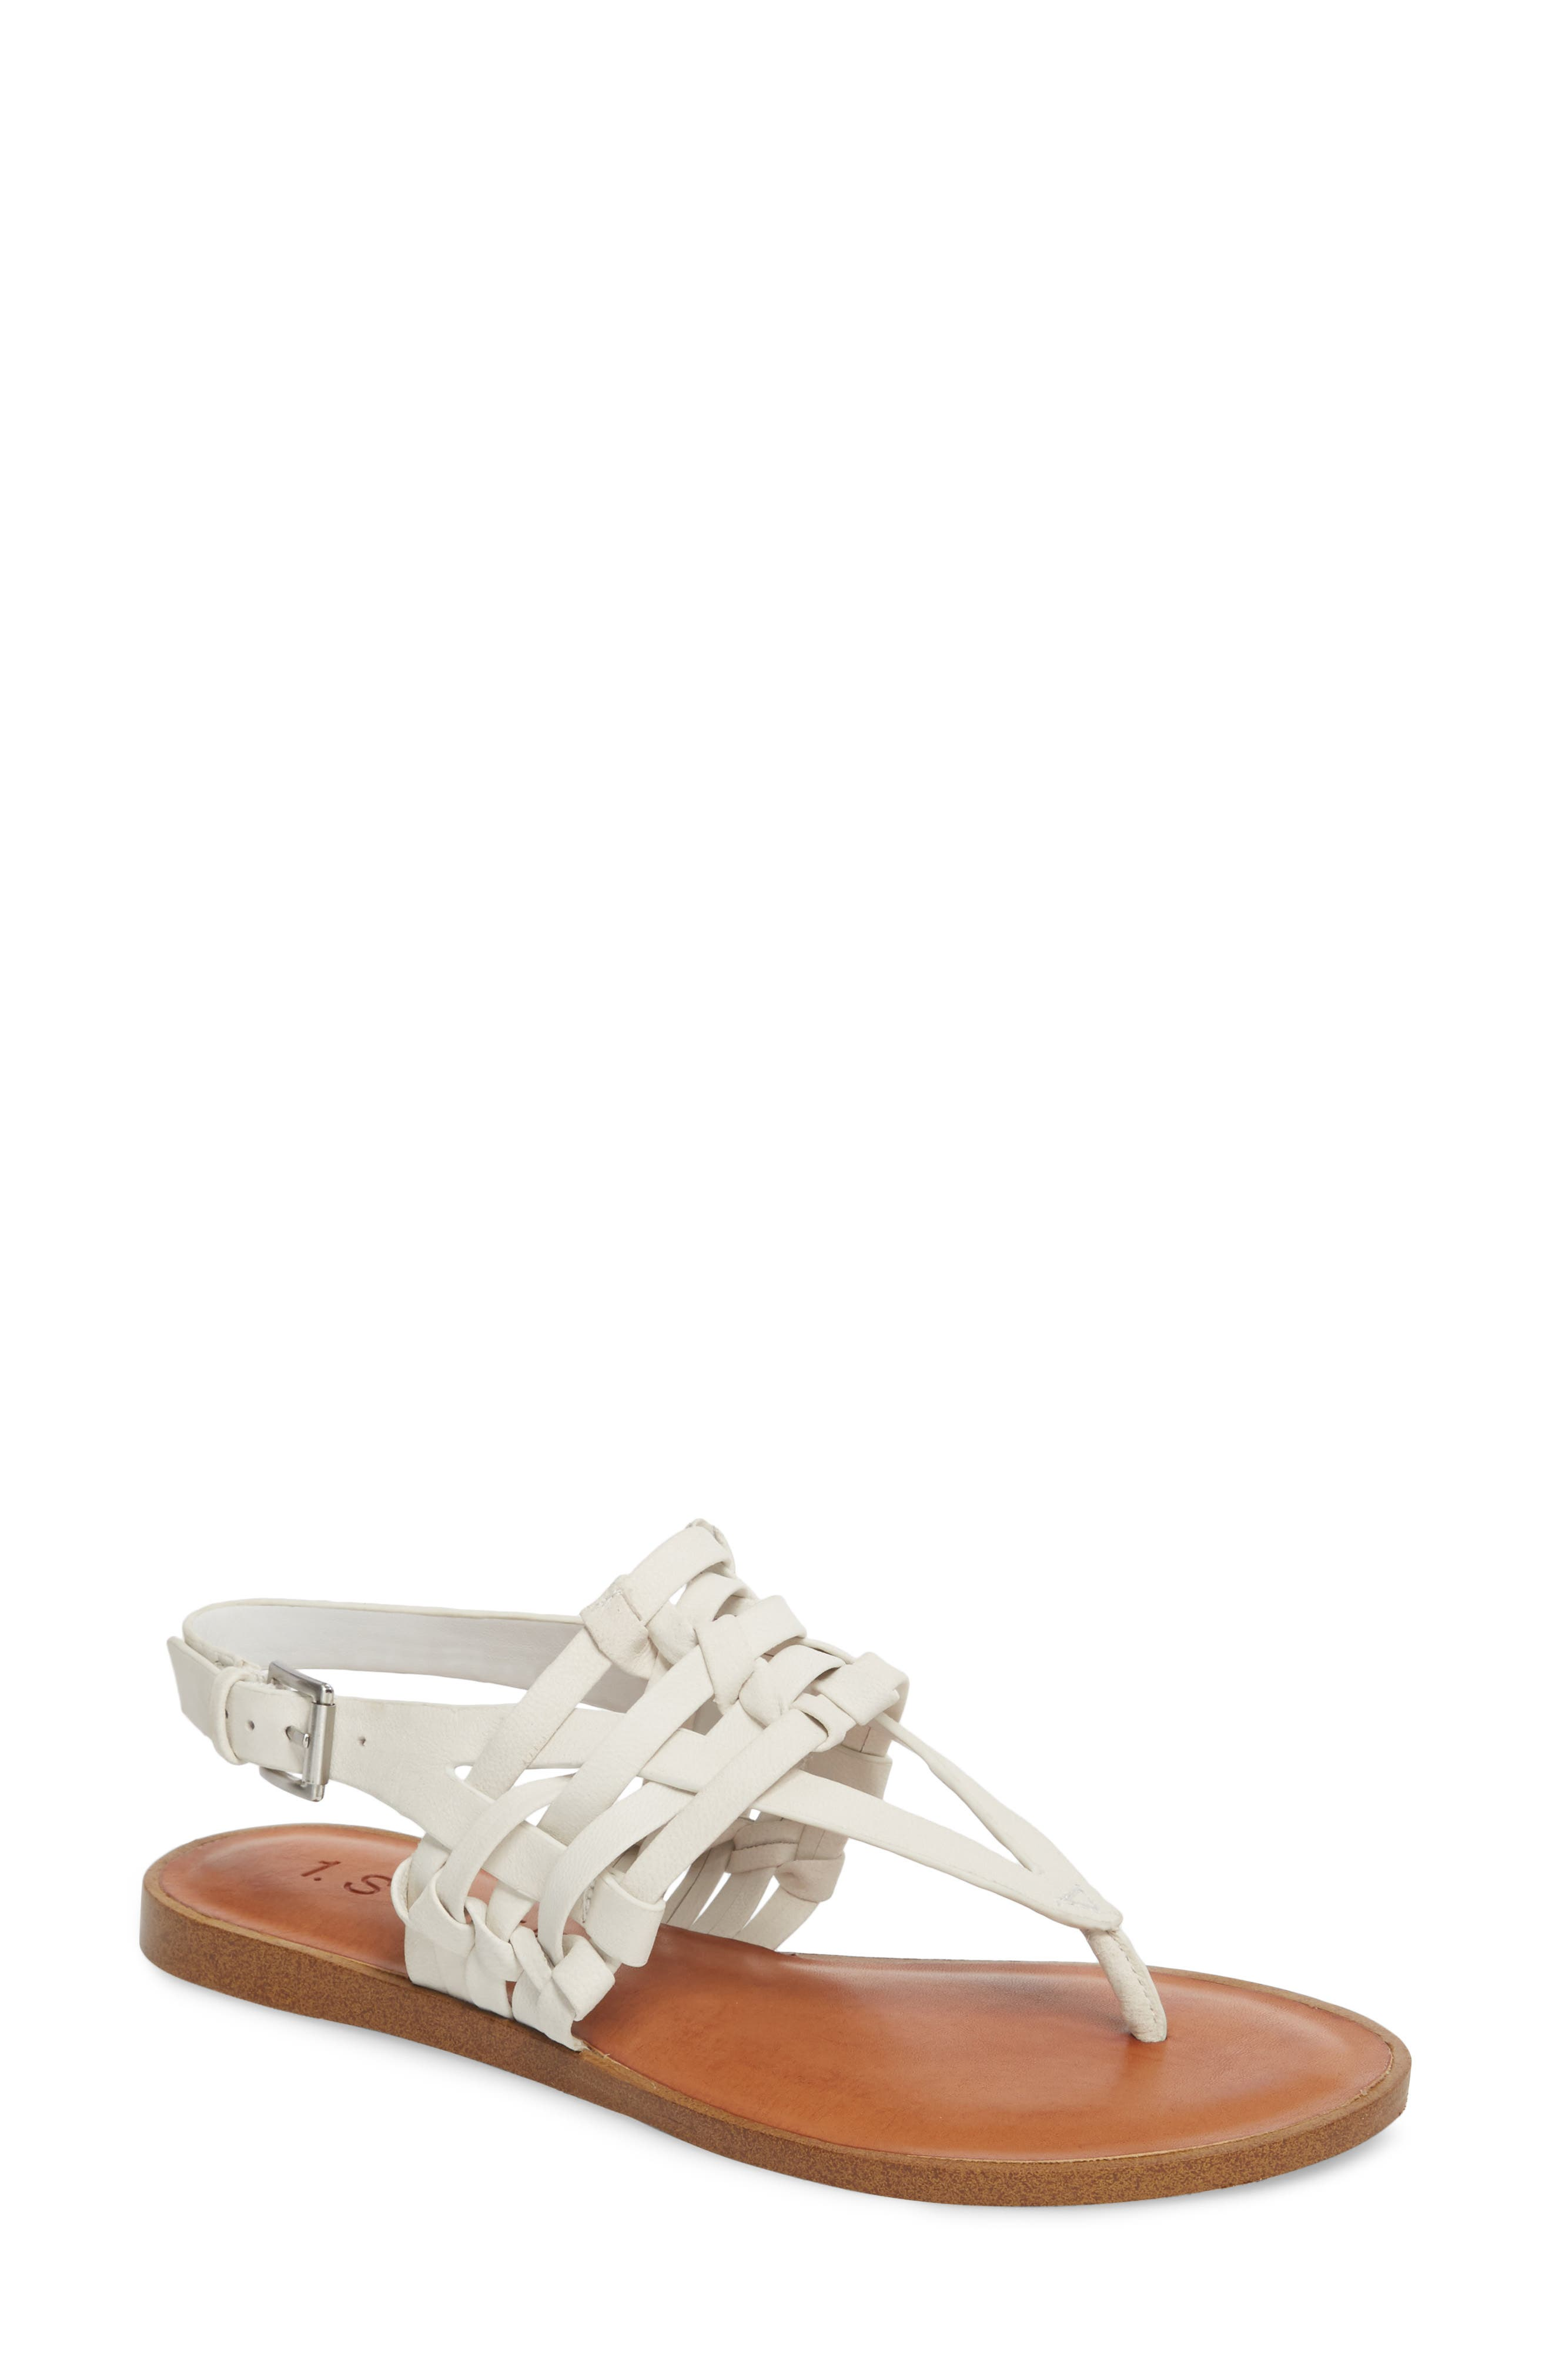 Lenn Sandal,                         Main,                         color, WHITE NUBUCK LEATHER